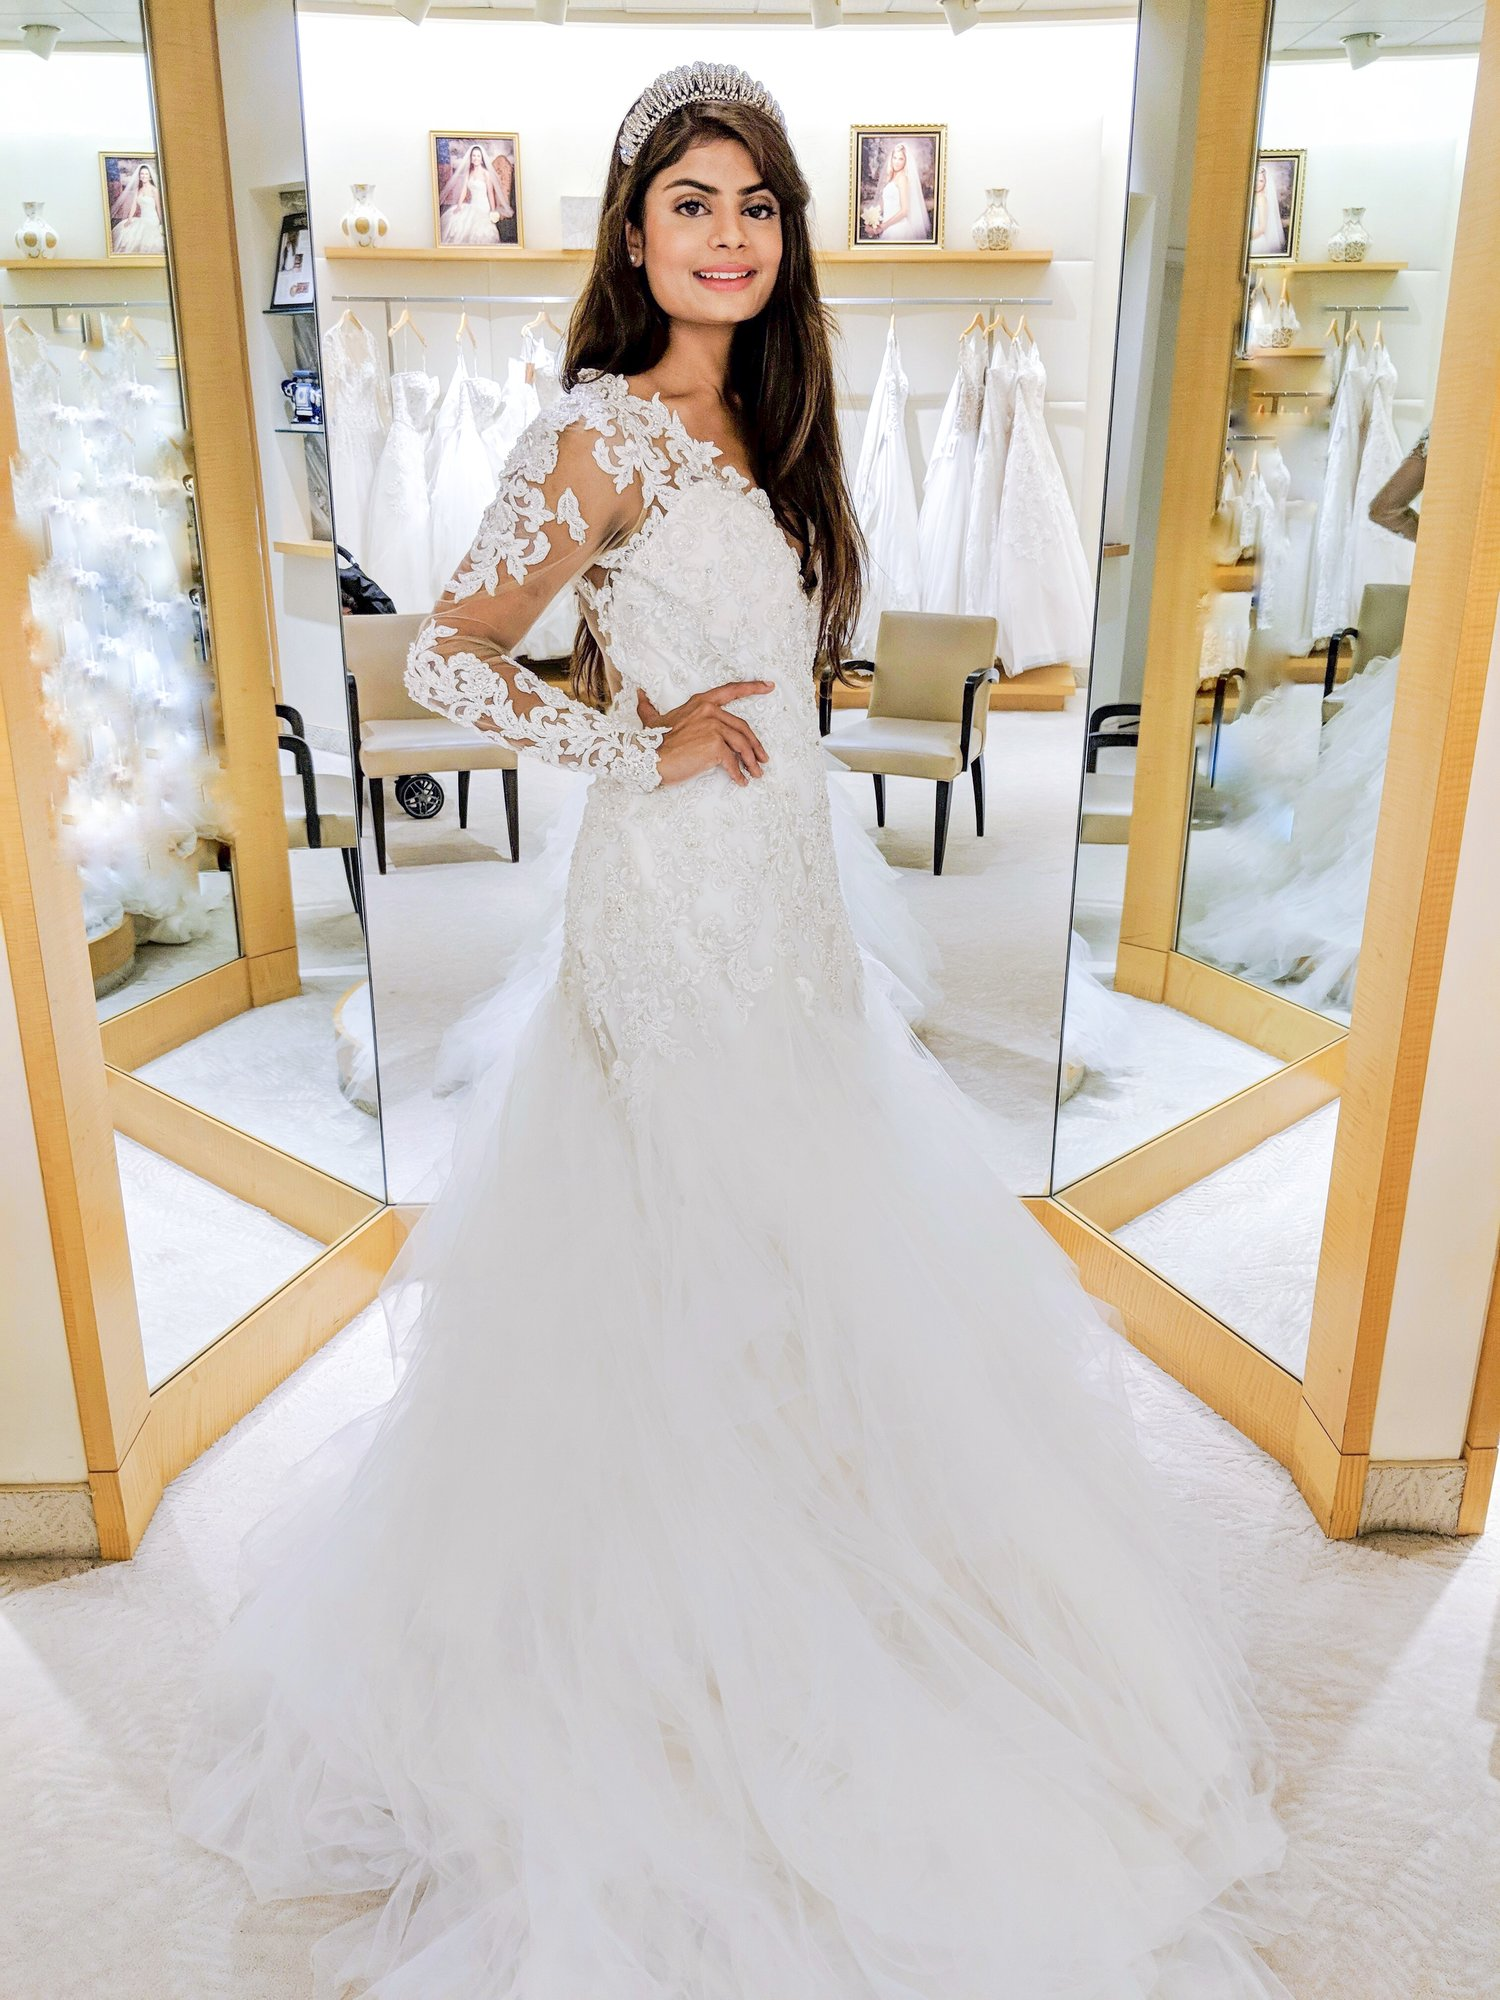 The White Wedding Dress Dream - Macy\'s Sponsored — Mariam Shibly